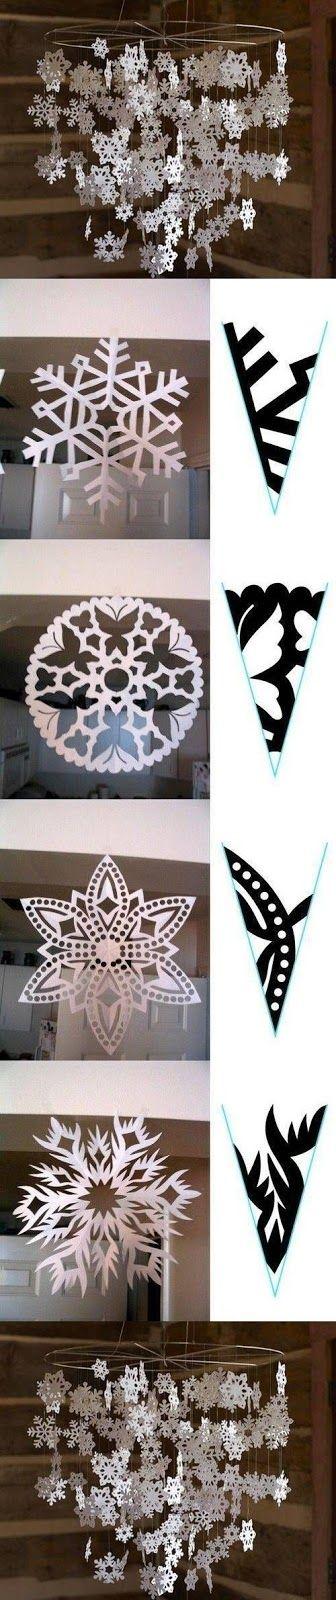 paper stars atterns